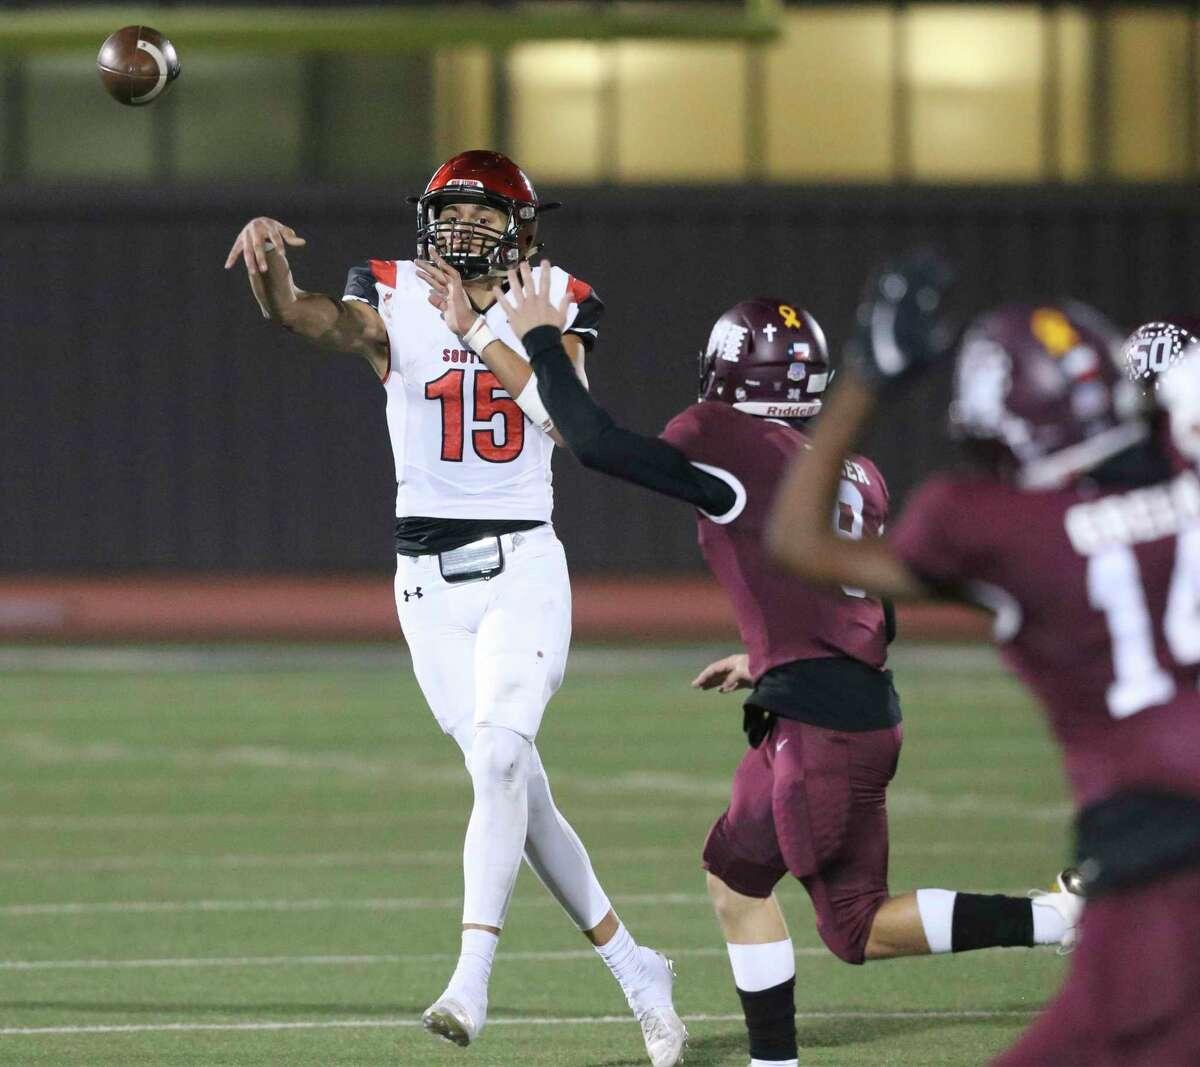 Cardinal quarterback Richard Torres picks a receiver as Southside plays Flour Bluff in high school football playoffs at Alamo Stadium on Dec. 17, 2020.